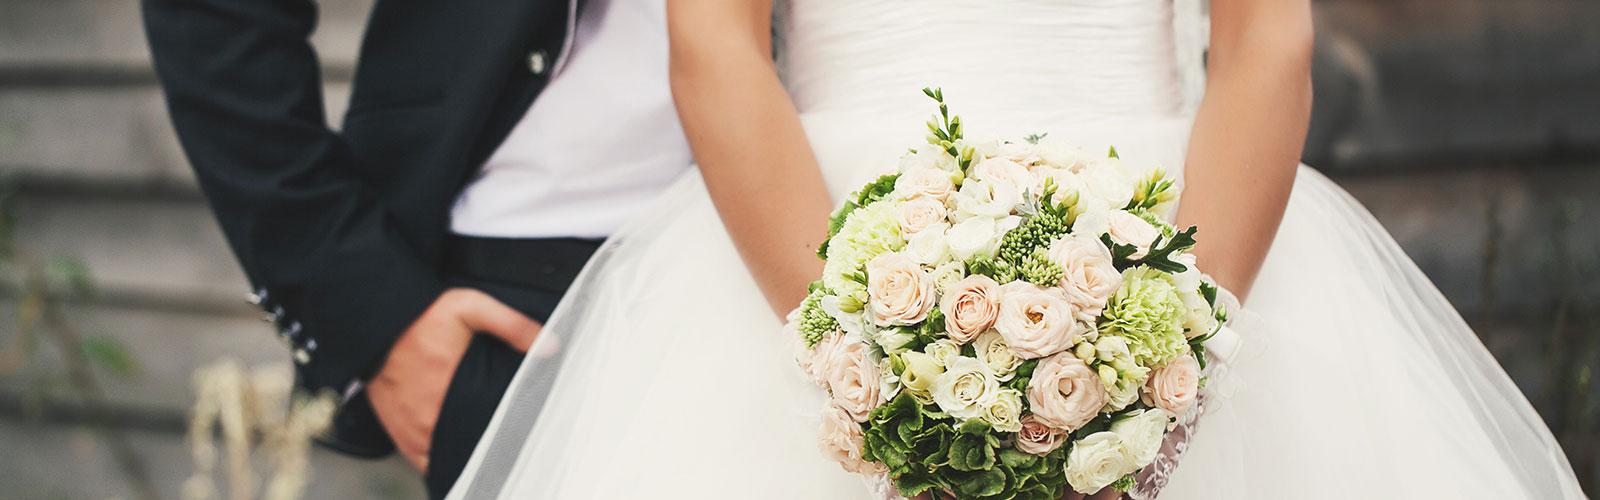 Wedding - sposarsi alle case